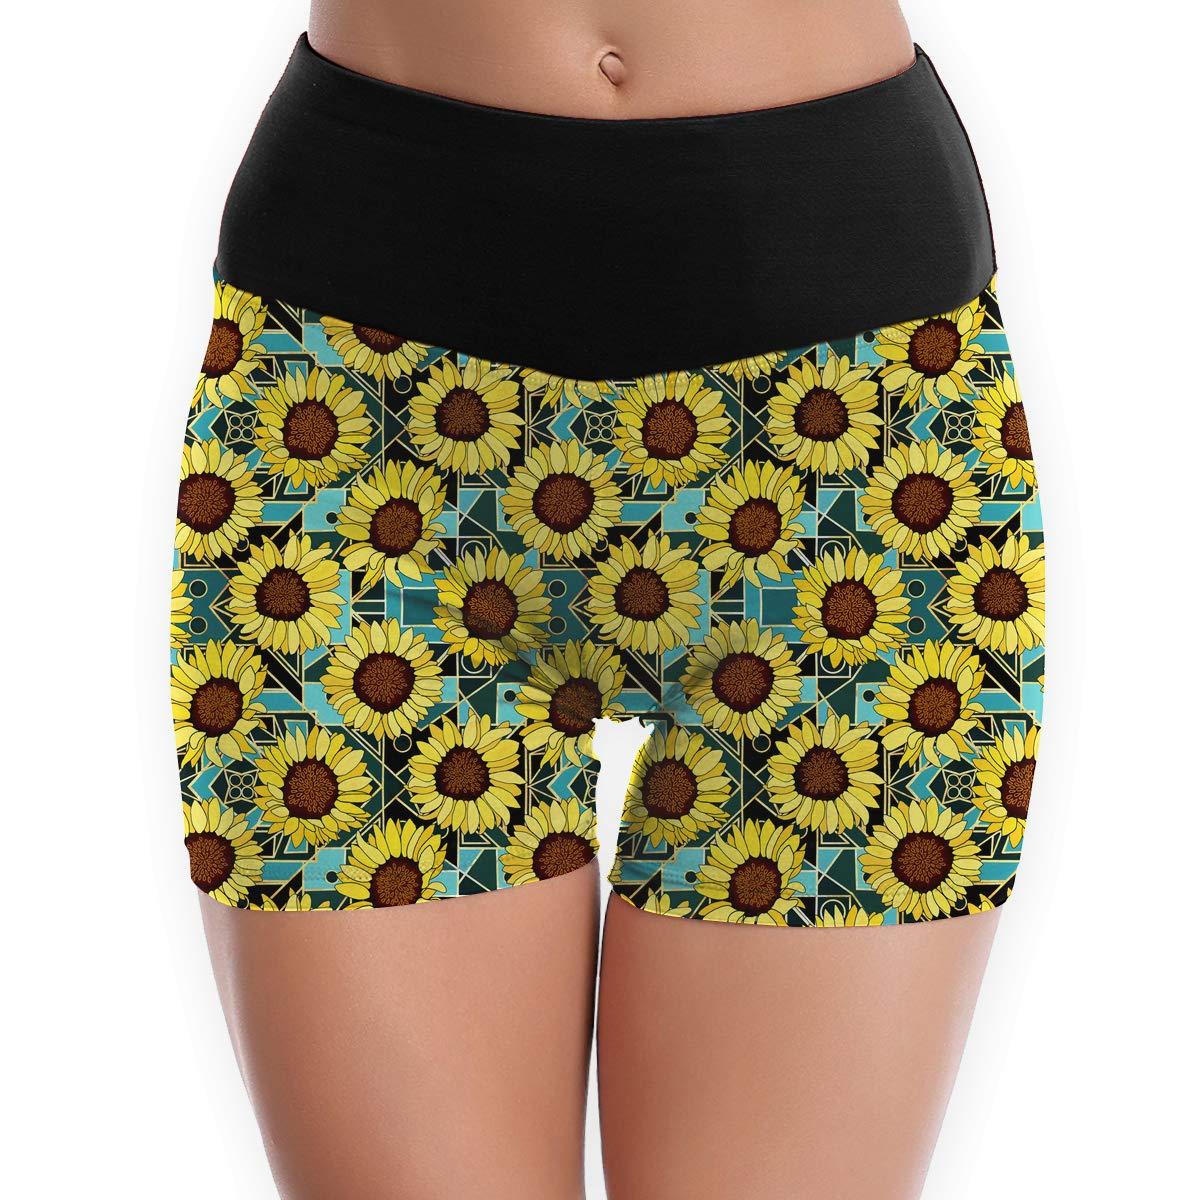 Matbt SunflowersArt Deco GoldTeal Big Yoga Tights Short Running Pants Workout